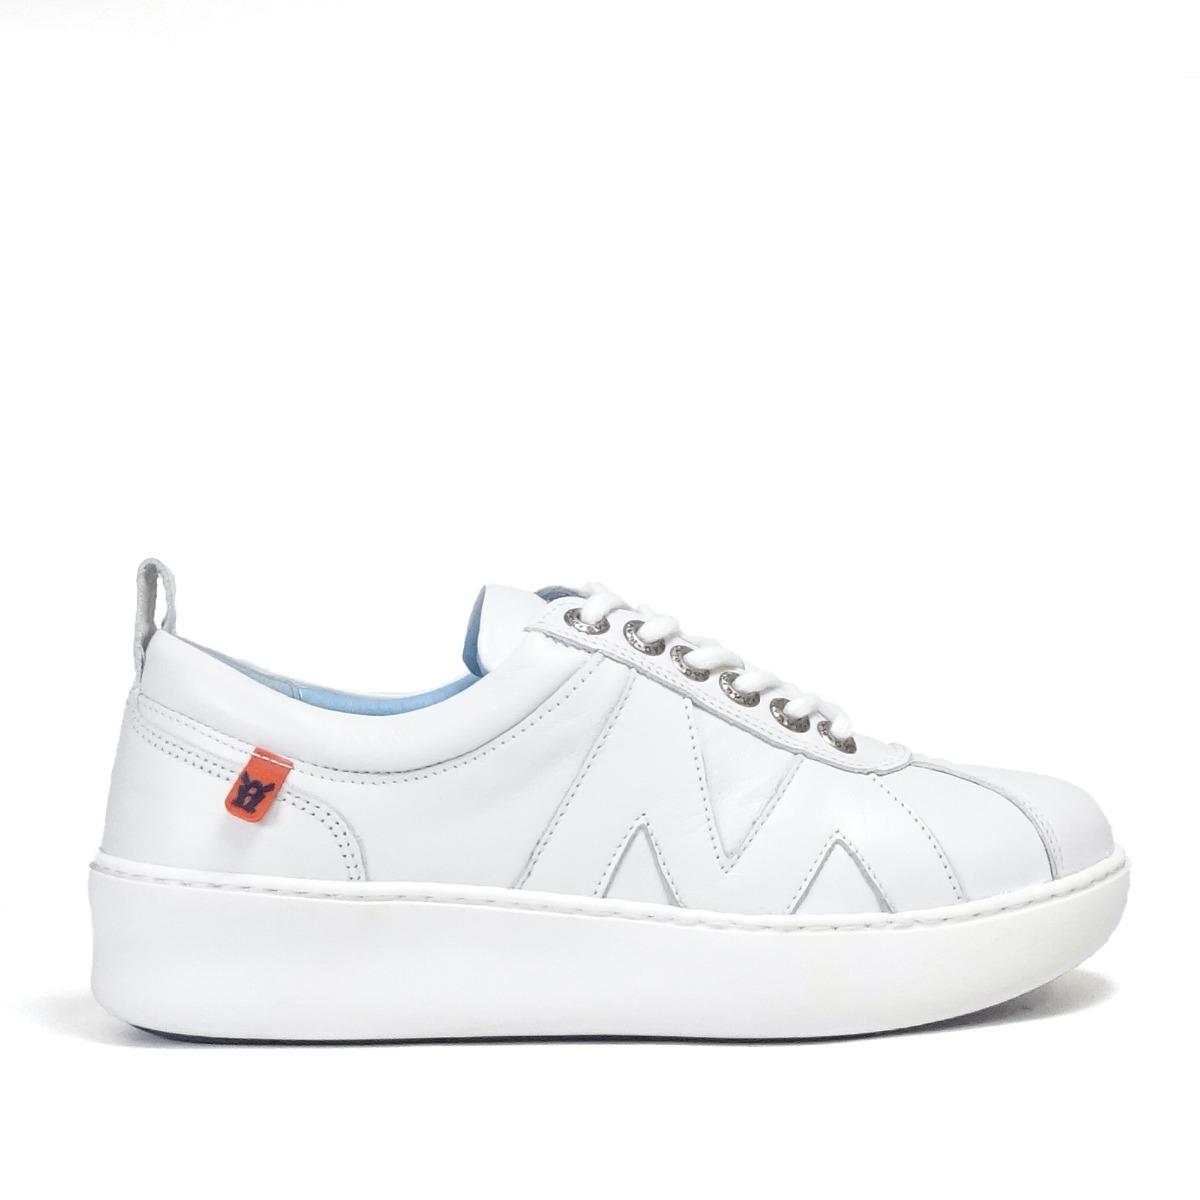 Sympasneaker 4231 Bright White